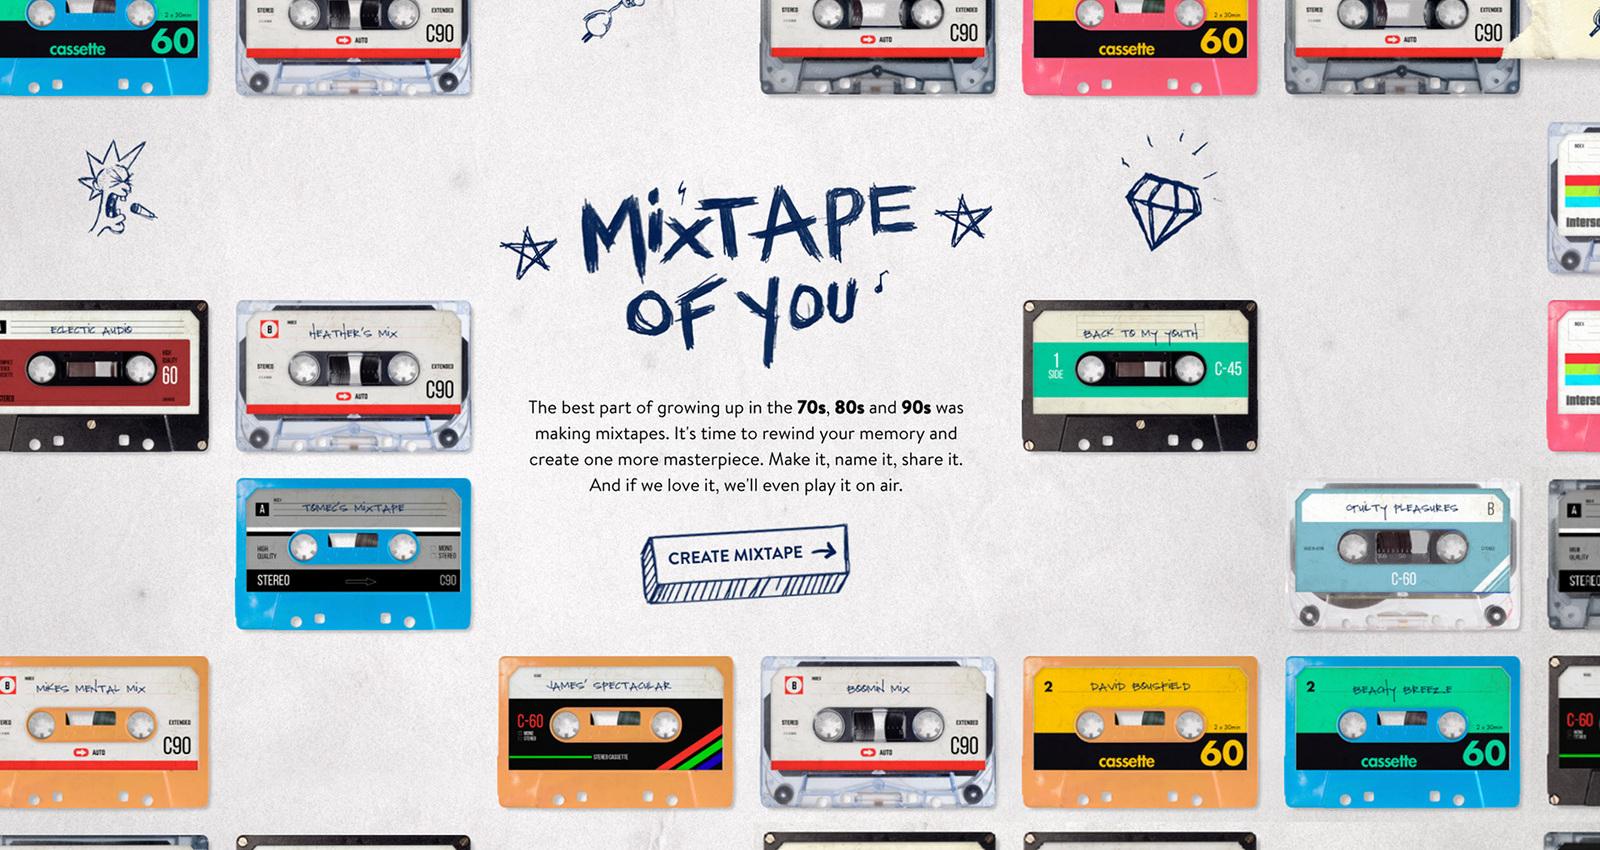 Mixtape Of You